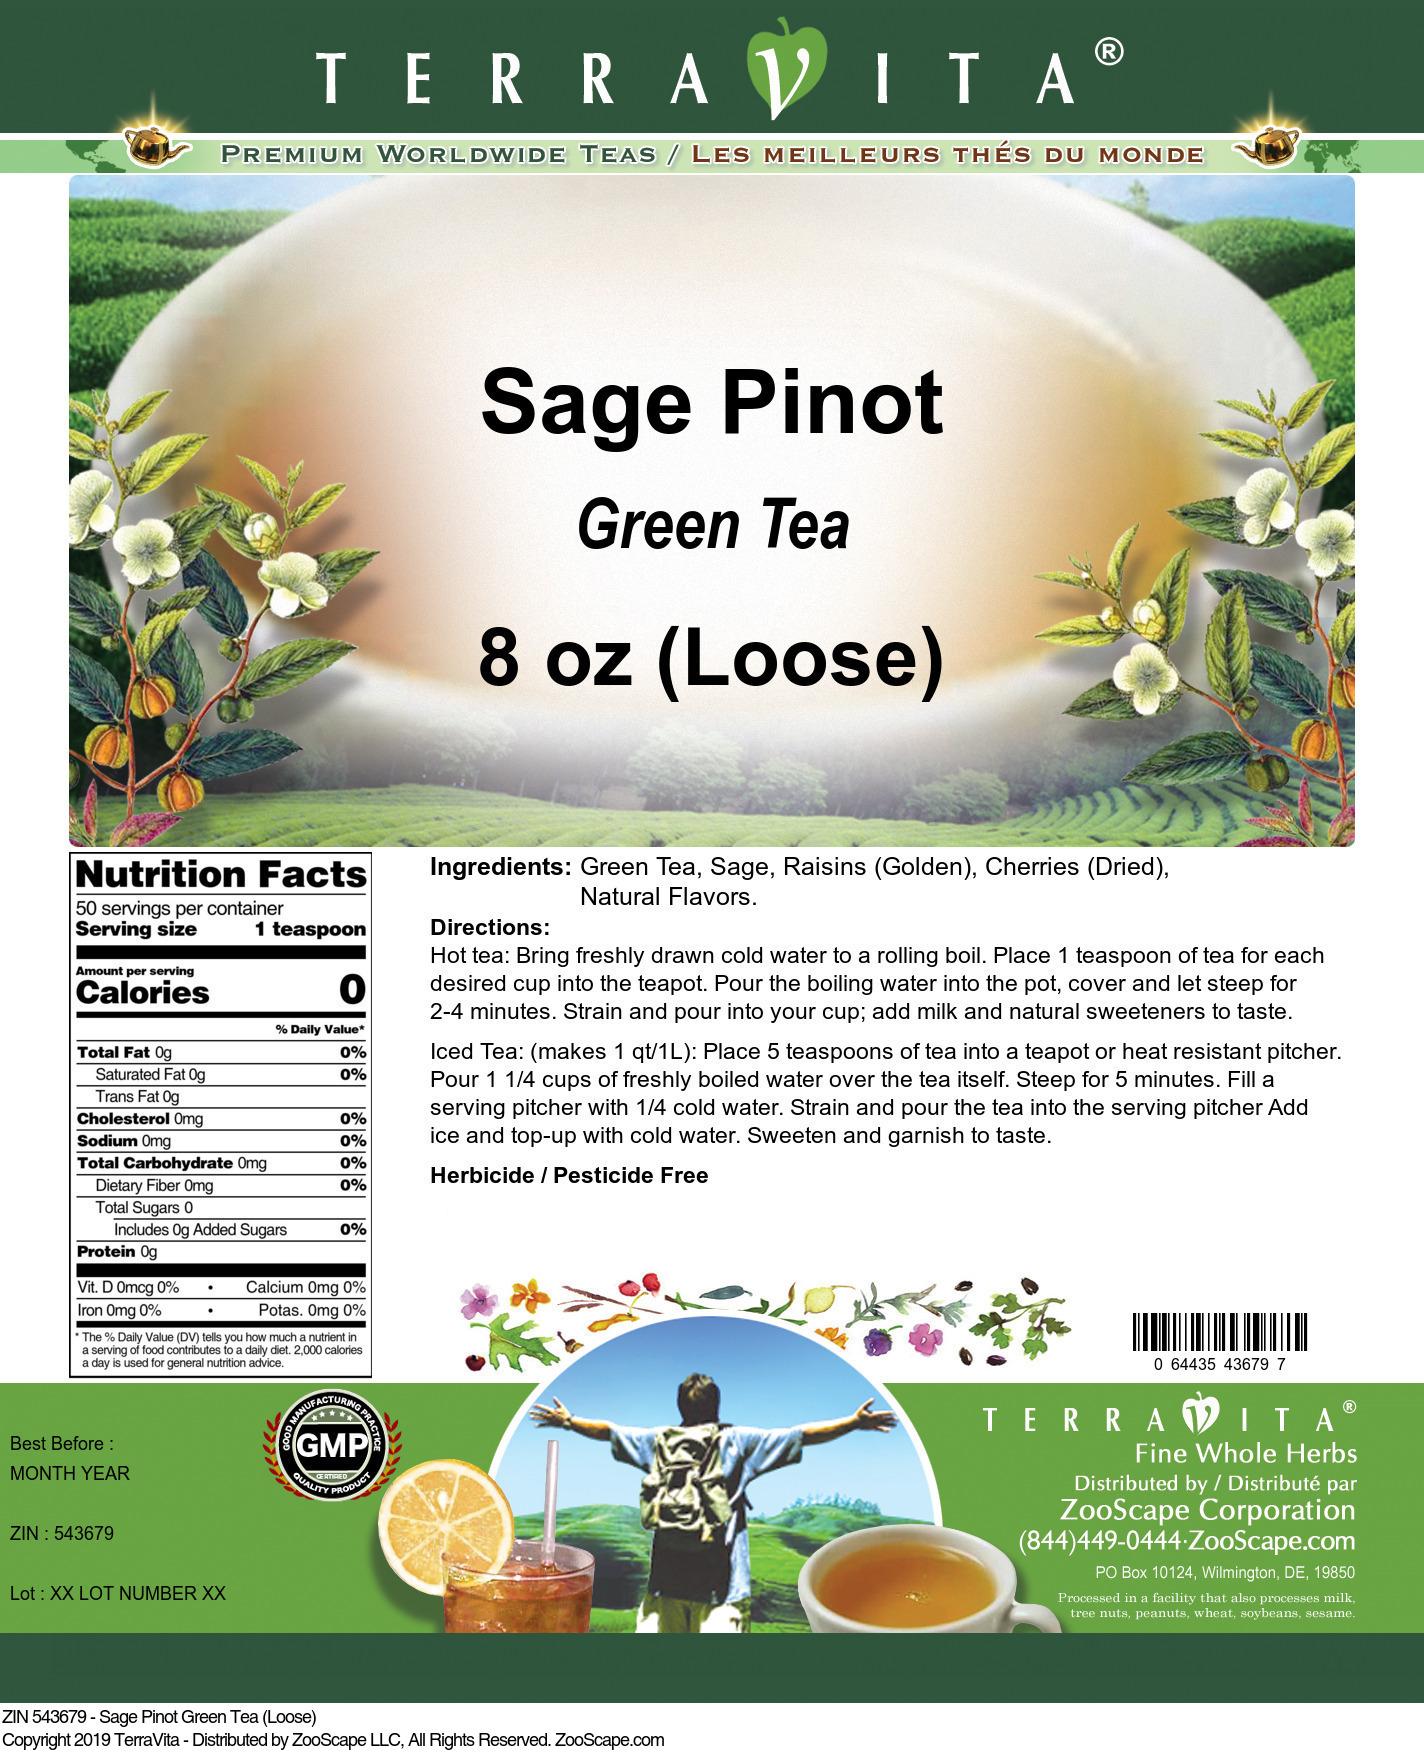 Sage Pinot Green Tea (Loose)